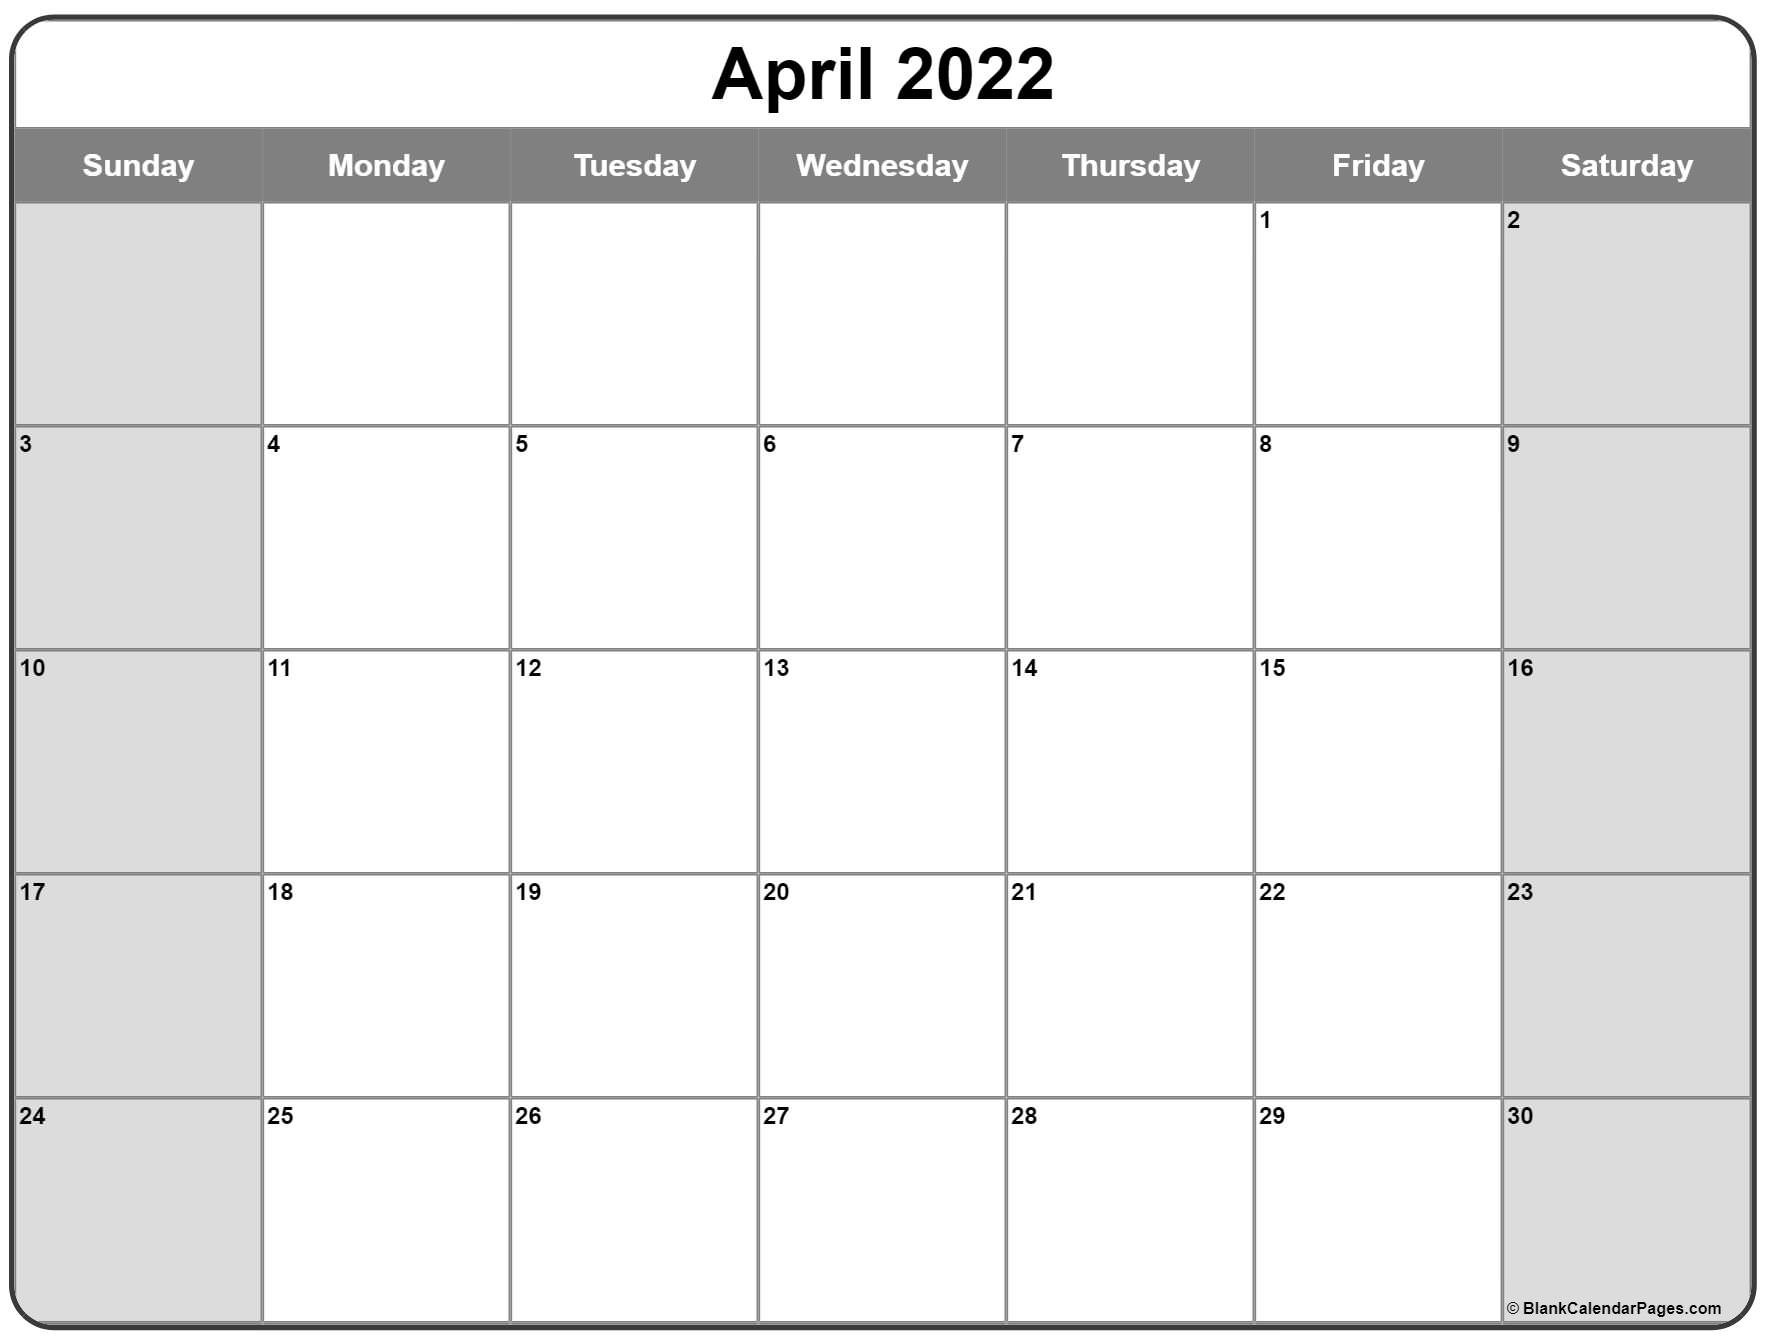 April 2022 Calendar | Free Printable Calendar Templates throughout April Calendar 2022 Free Printable